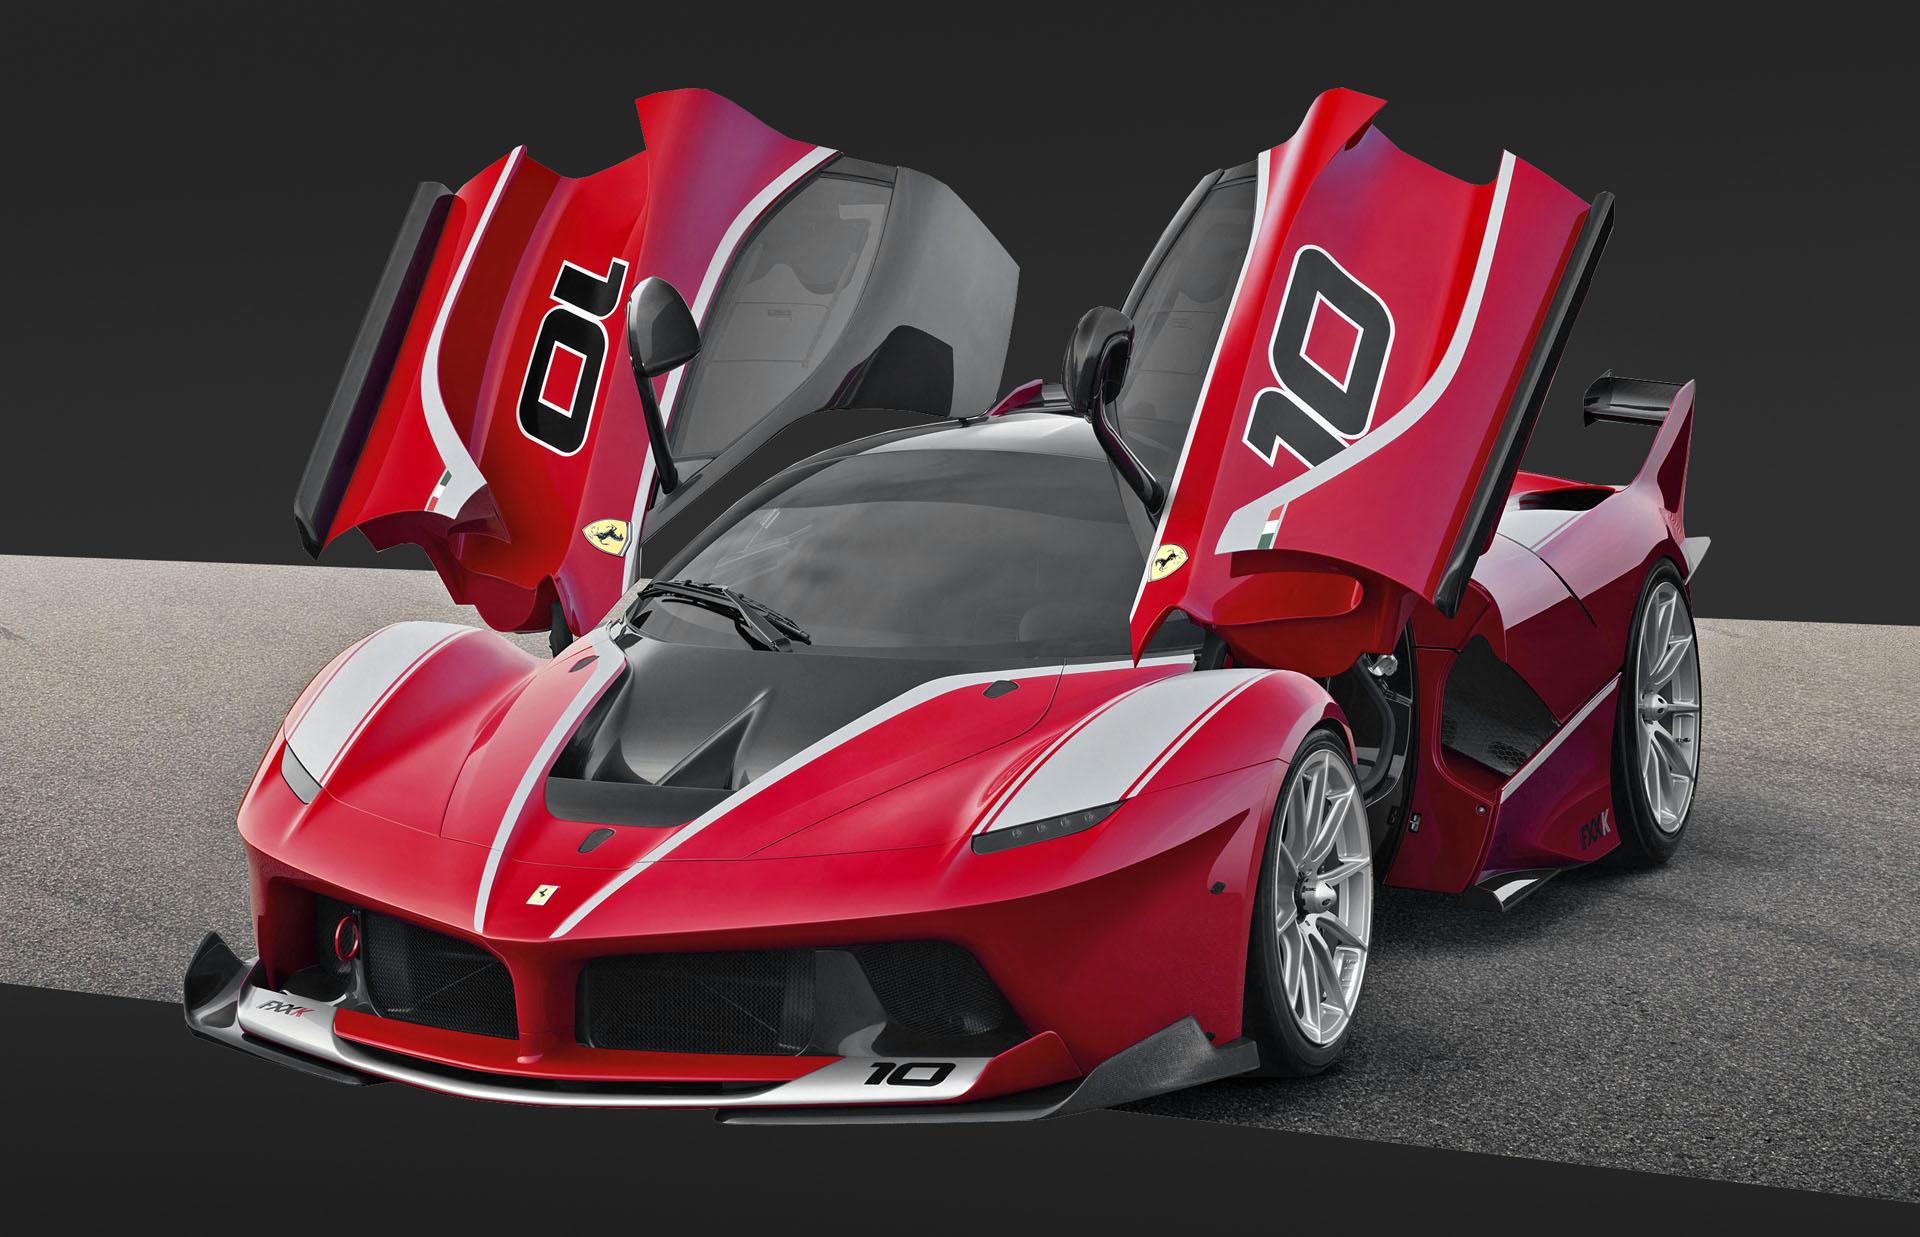 Ferrari FXX K track car